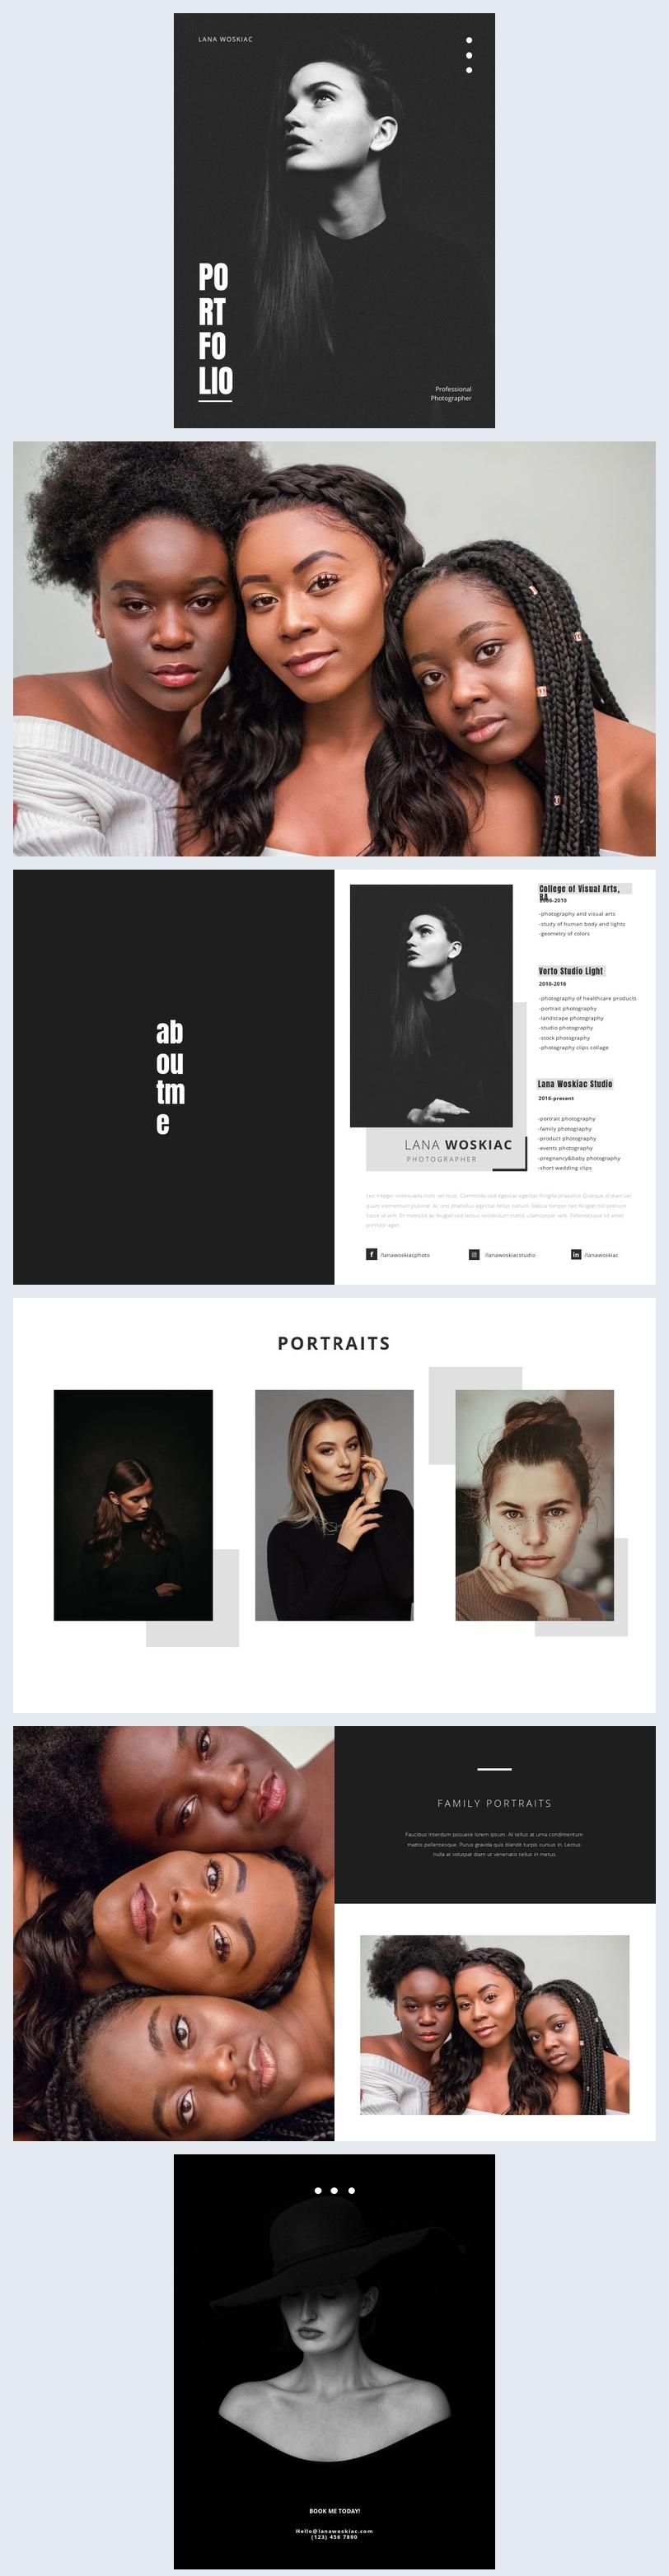 Digital Photography Portfolio Template